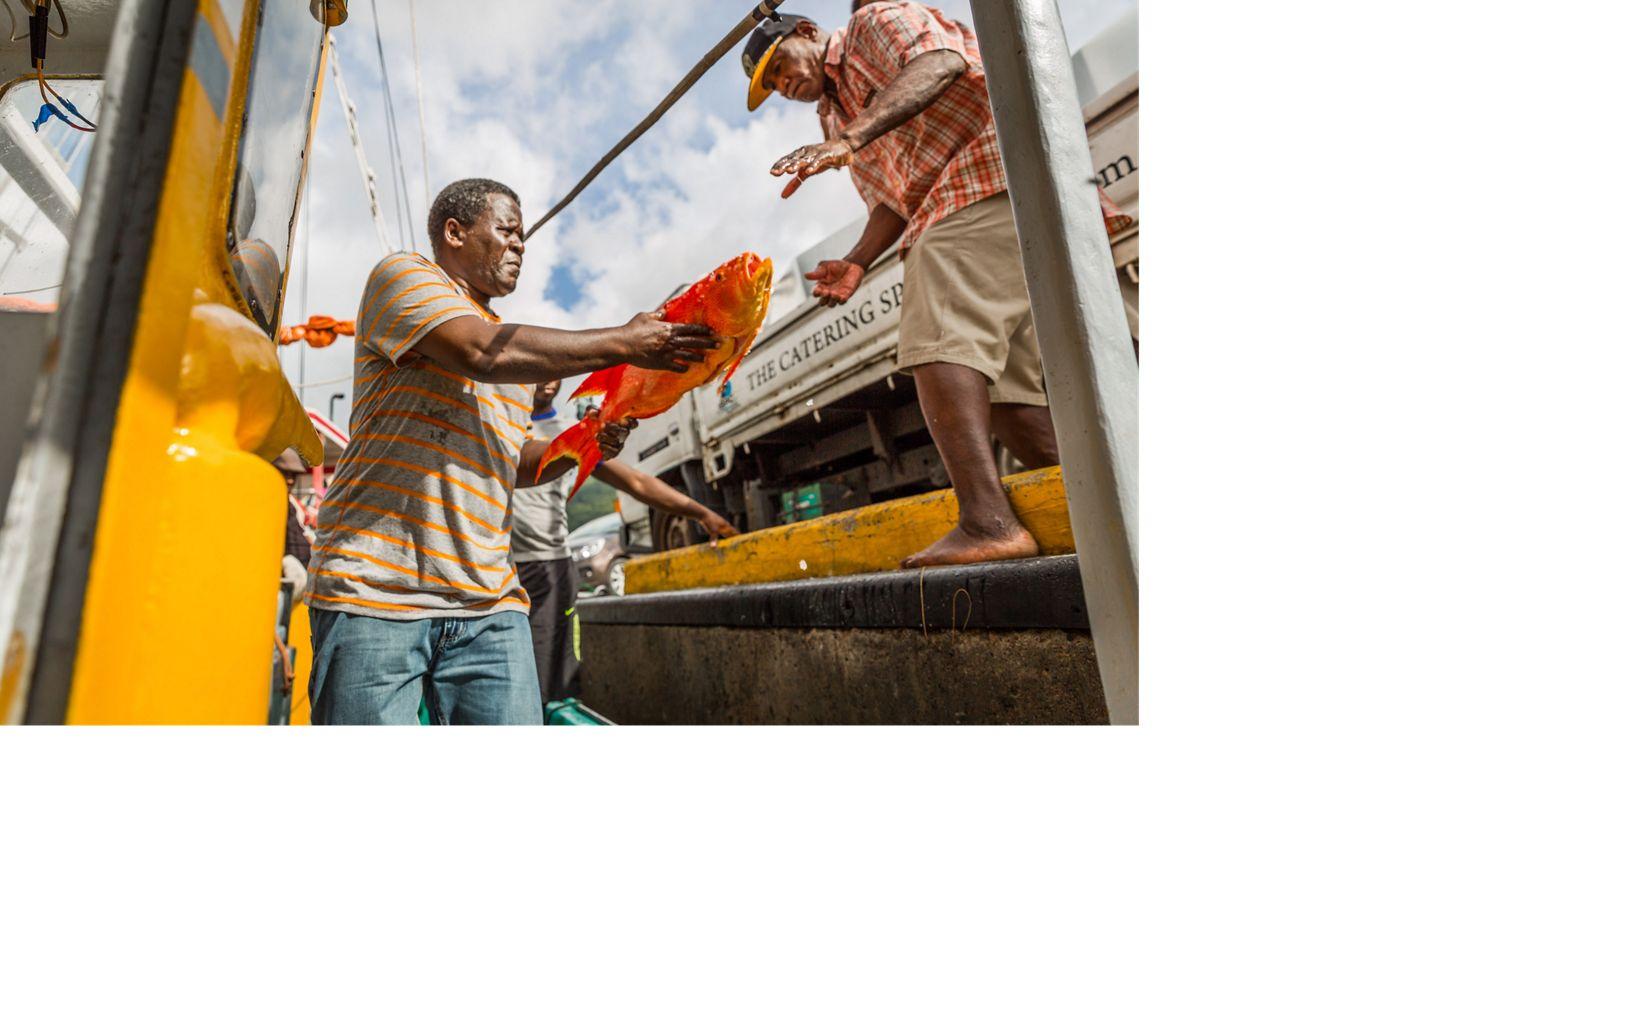 Jean de Dieu Leonel, captain of the Felicite, unloading unidentified bottom fish from the Felicite, Seychelles.